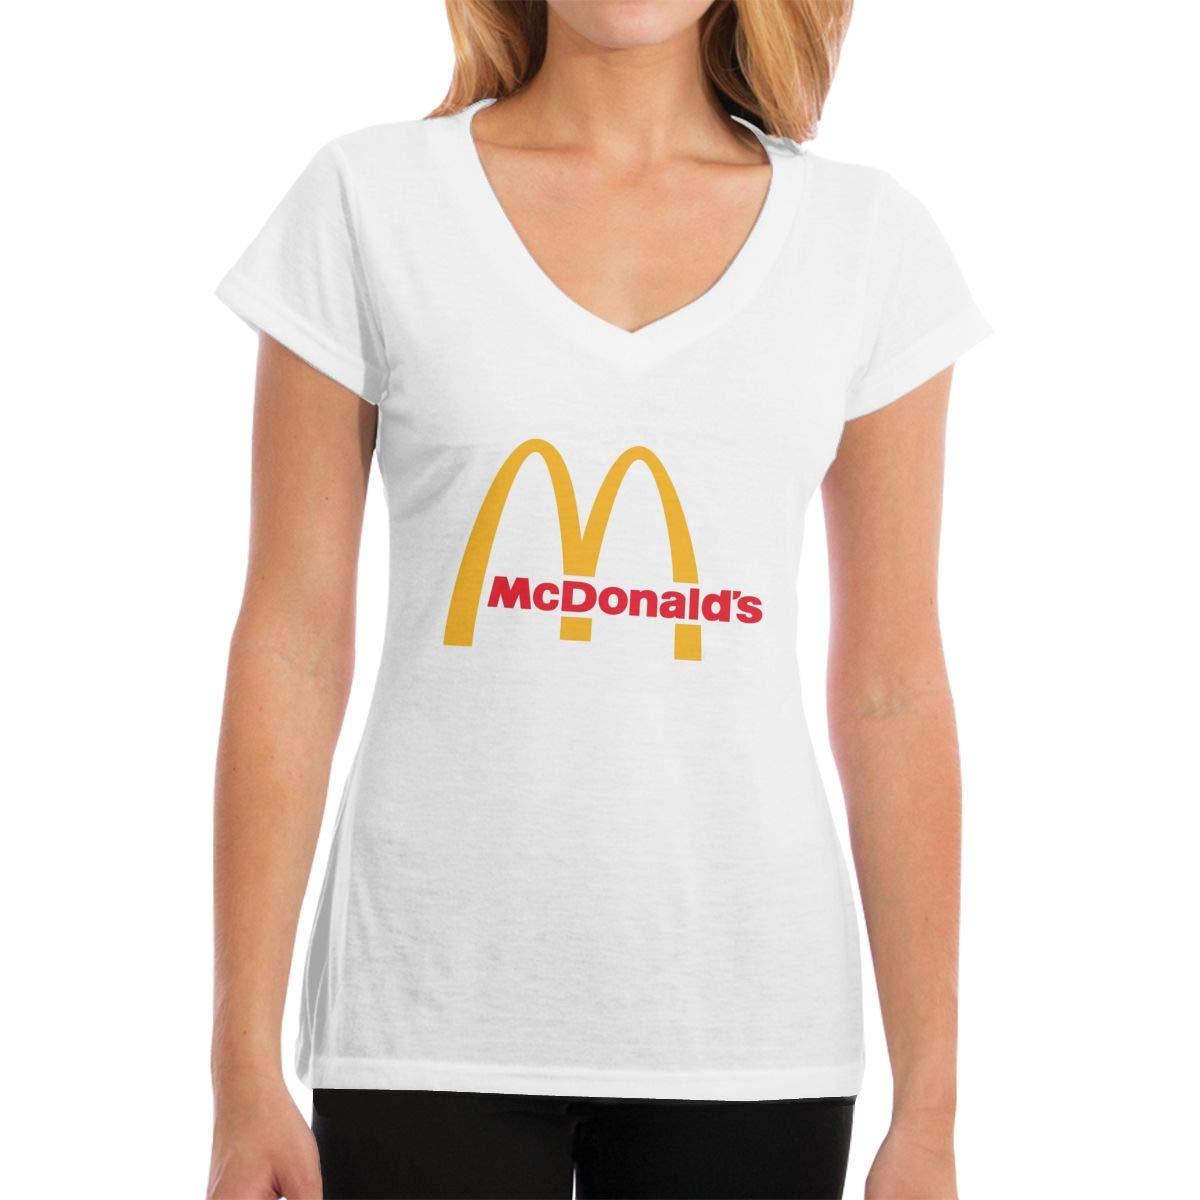 Lakssn Women's Youth Girls McDonalds Logo Tee Shirts Short Sleeve T Shirt for Women Girls T-Shirt Round Neck Cotton Tshirt White XL by Lakssn